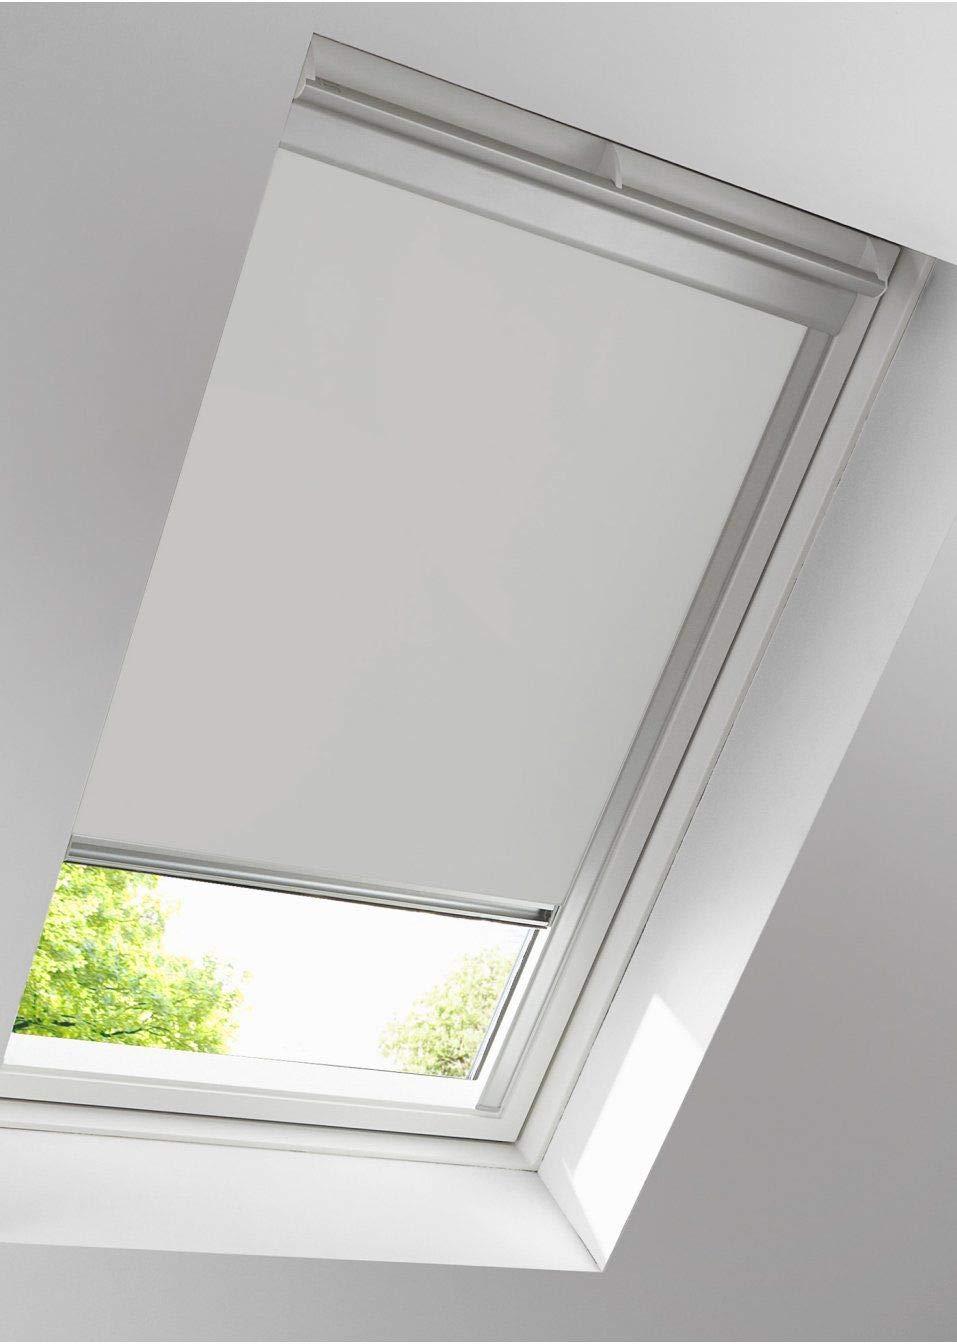 VERTICALUX Sonnenschutz - Original Rollo für Dachfenster Skylight Skylight Skylight (Uni DUNKELBLAU, 66x98) e9b587